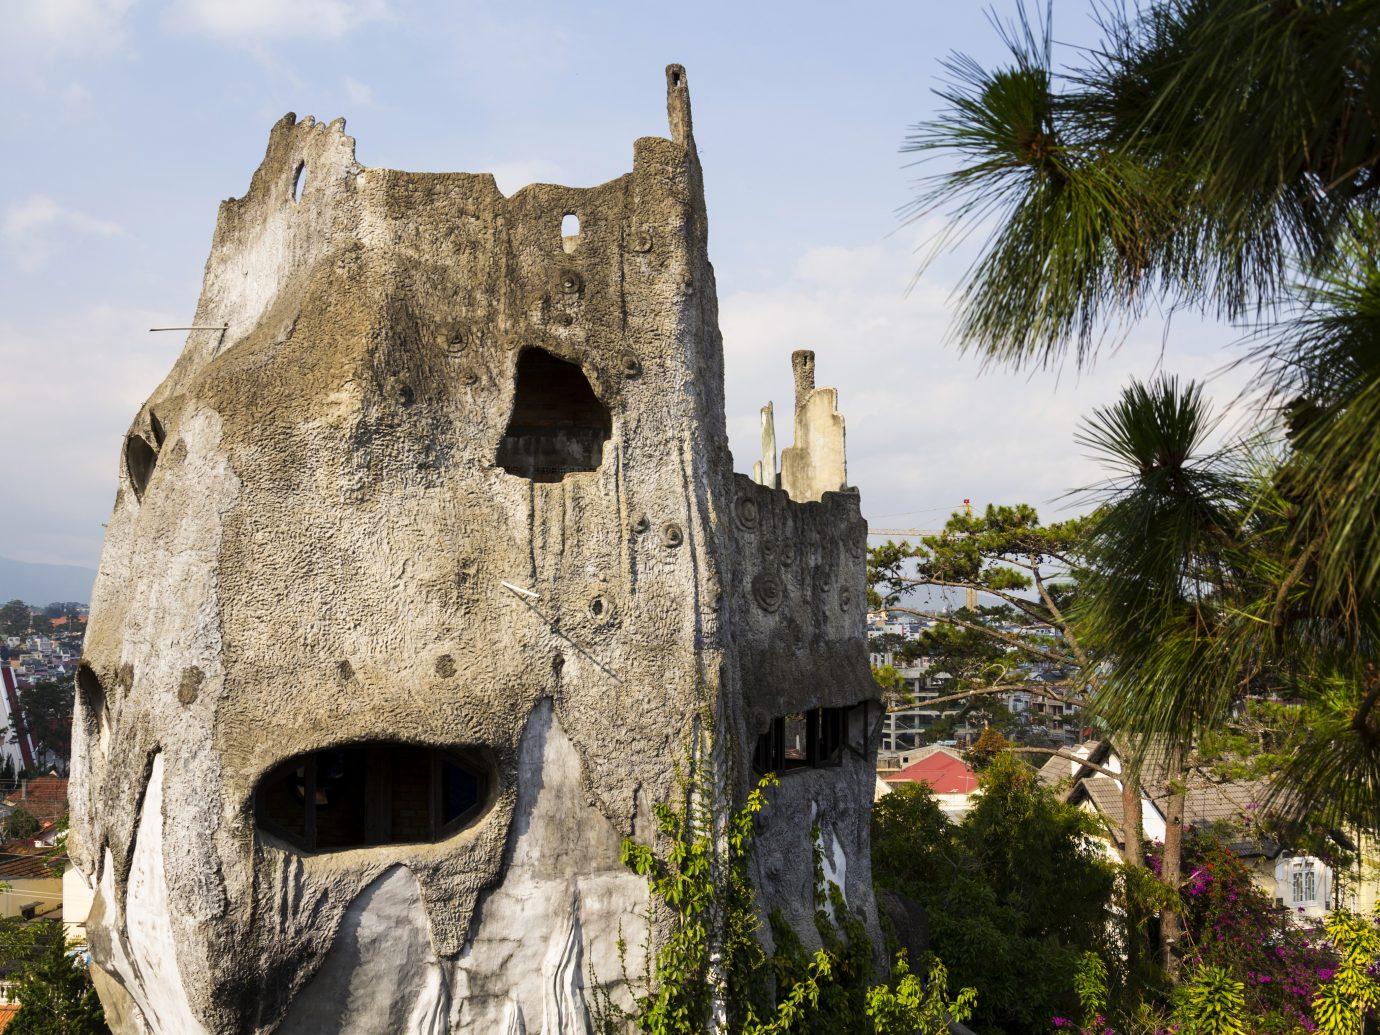 Bizarre construction of the Crazy house in Dalat, Vietnam